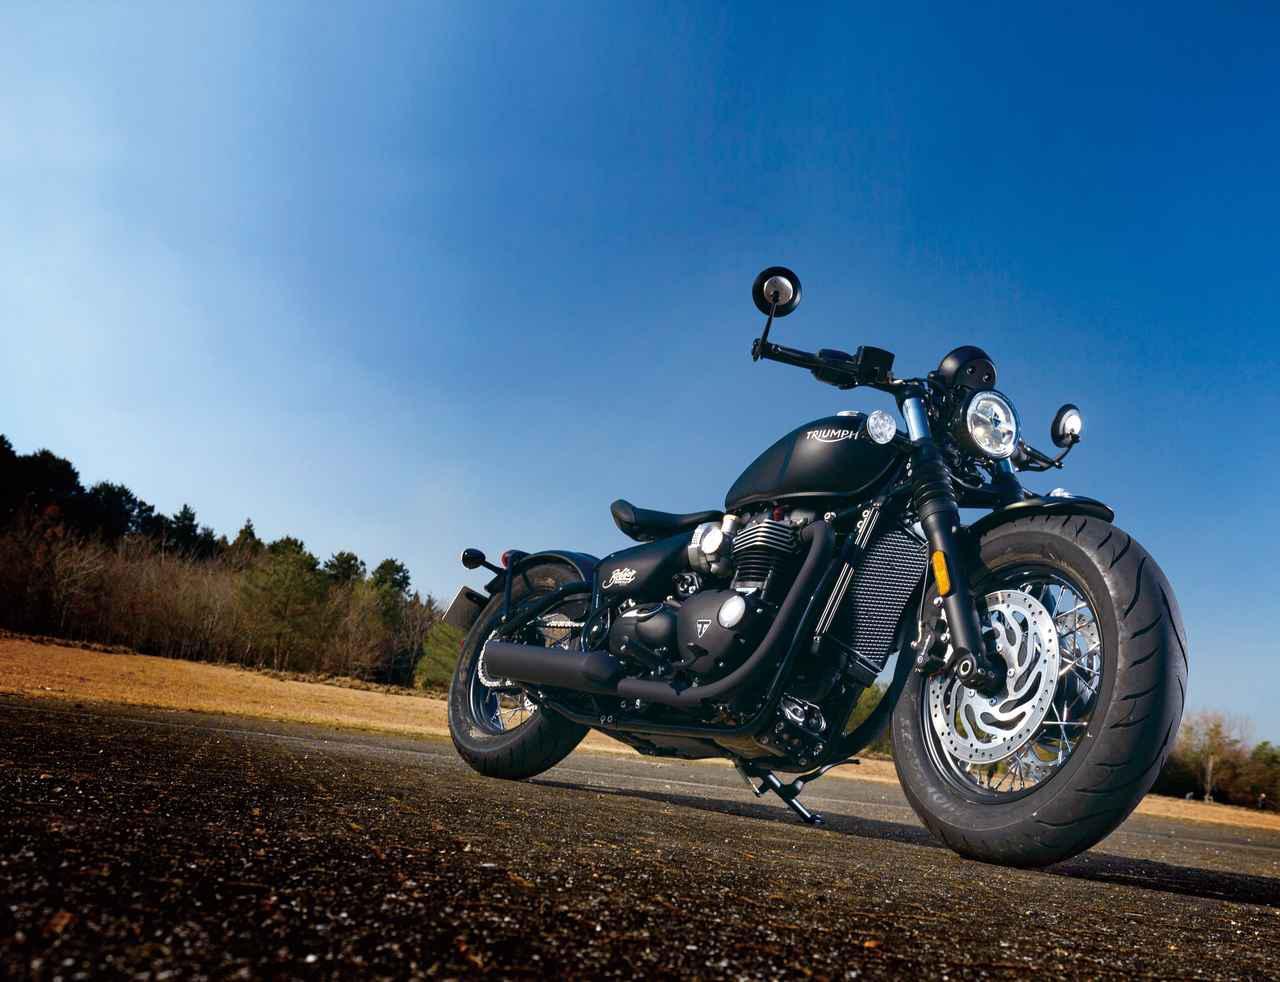 G-SHOCKの「ブラックアウト」モデルが、マスターオブGシリーズから2機種新登場! 革ジャンや黒いバイクとの相性抜群